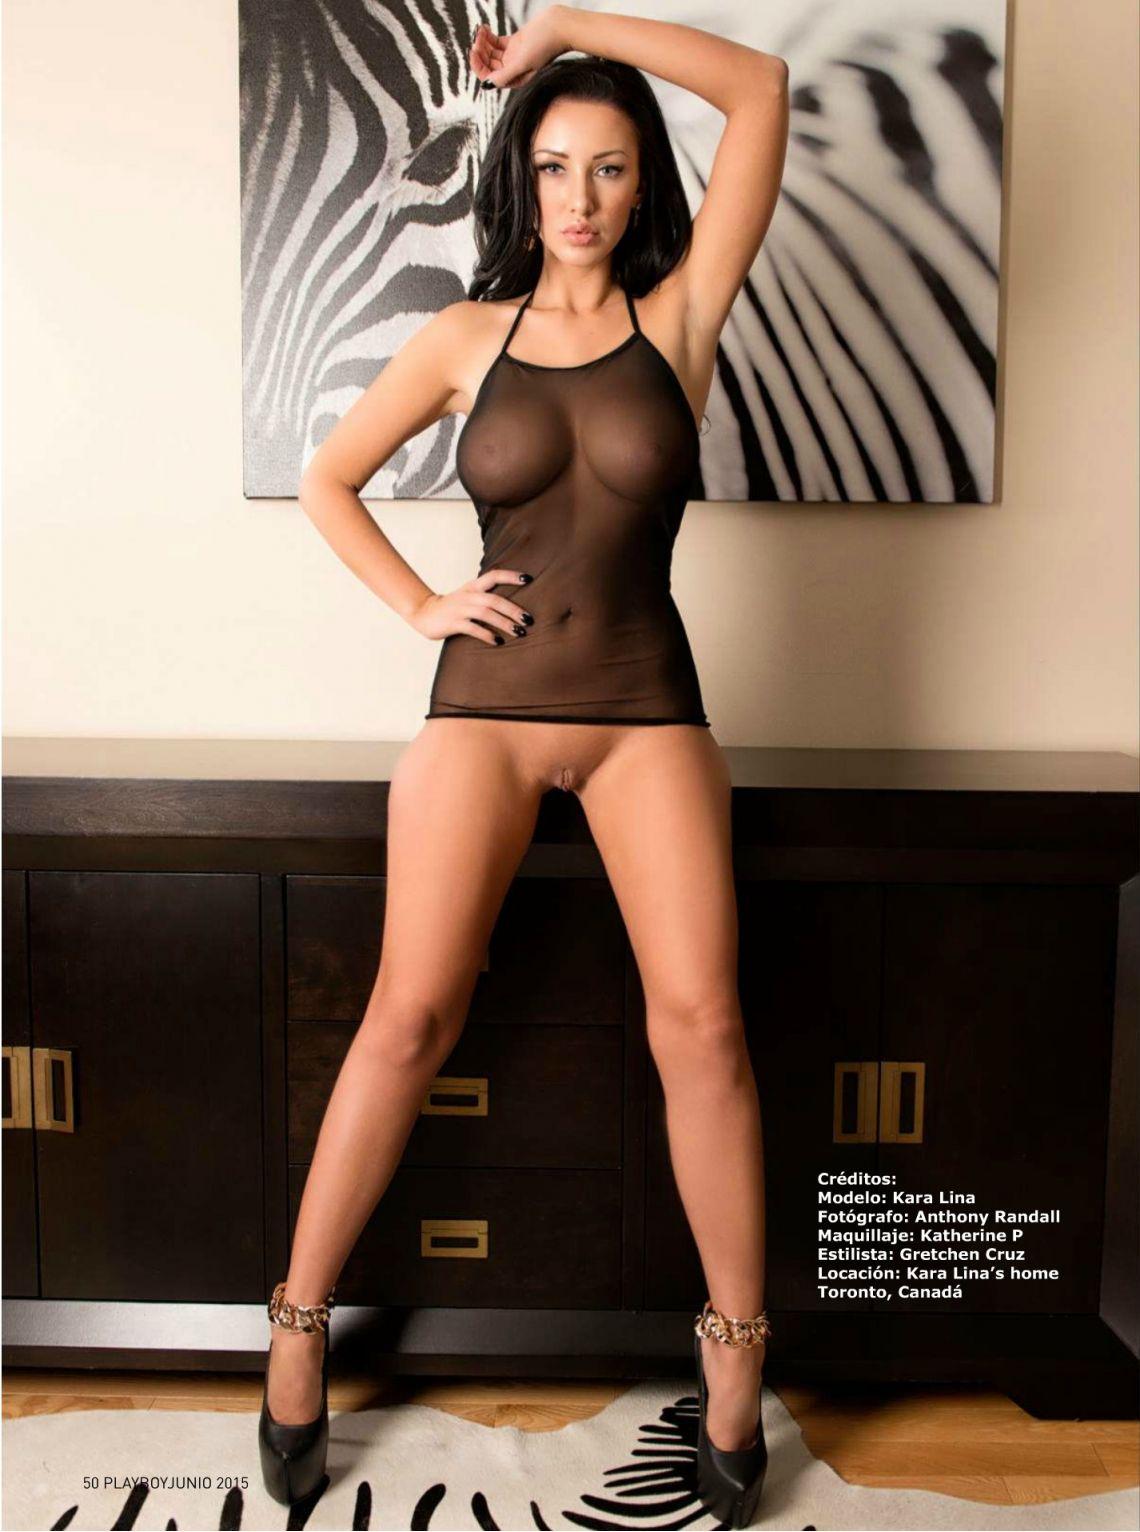 Alina h undresses and masturbates on wooden chair - 1 4